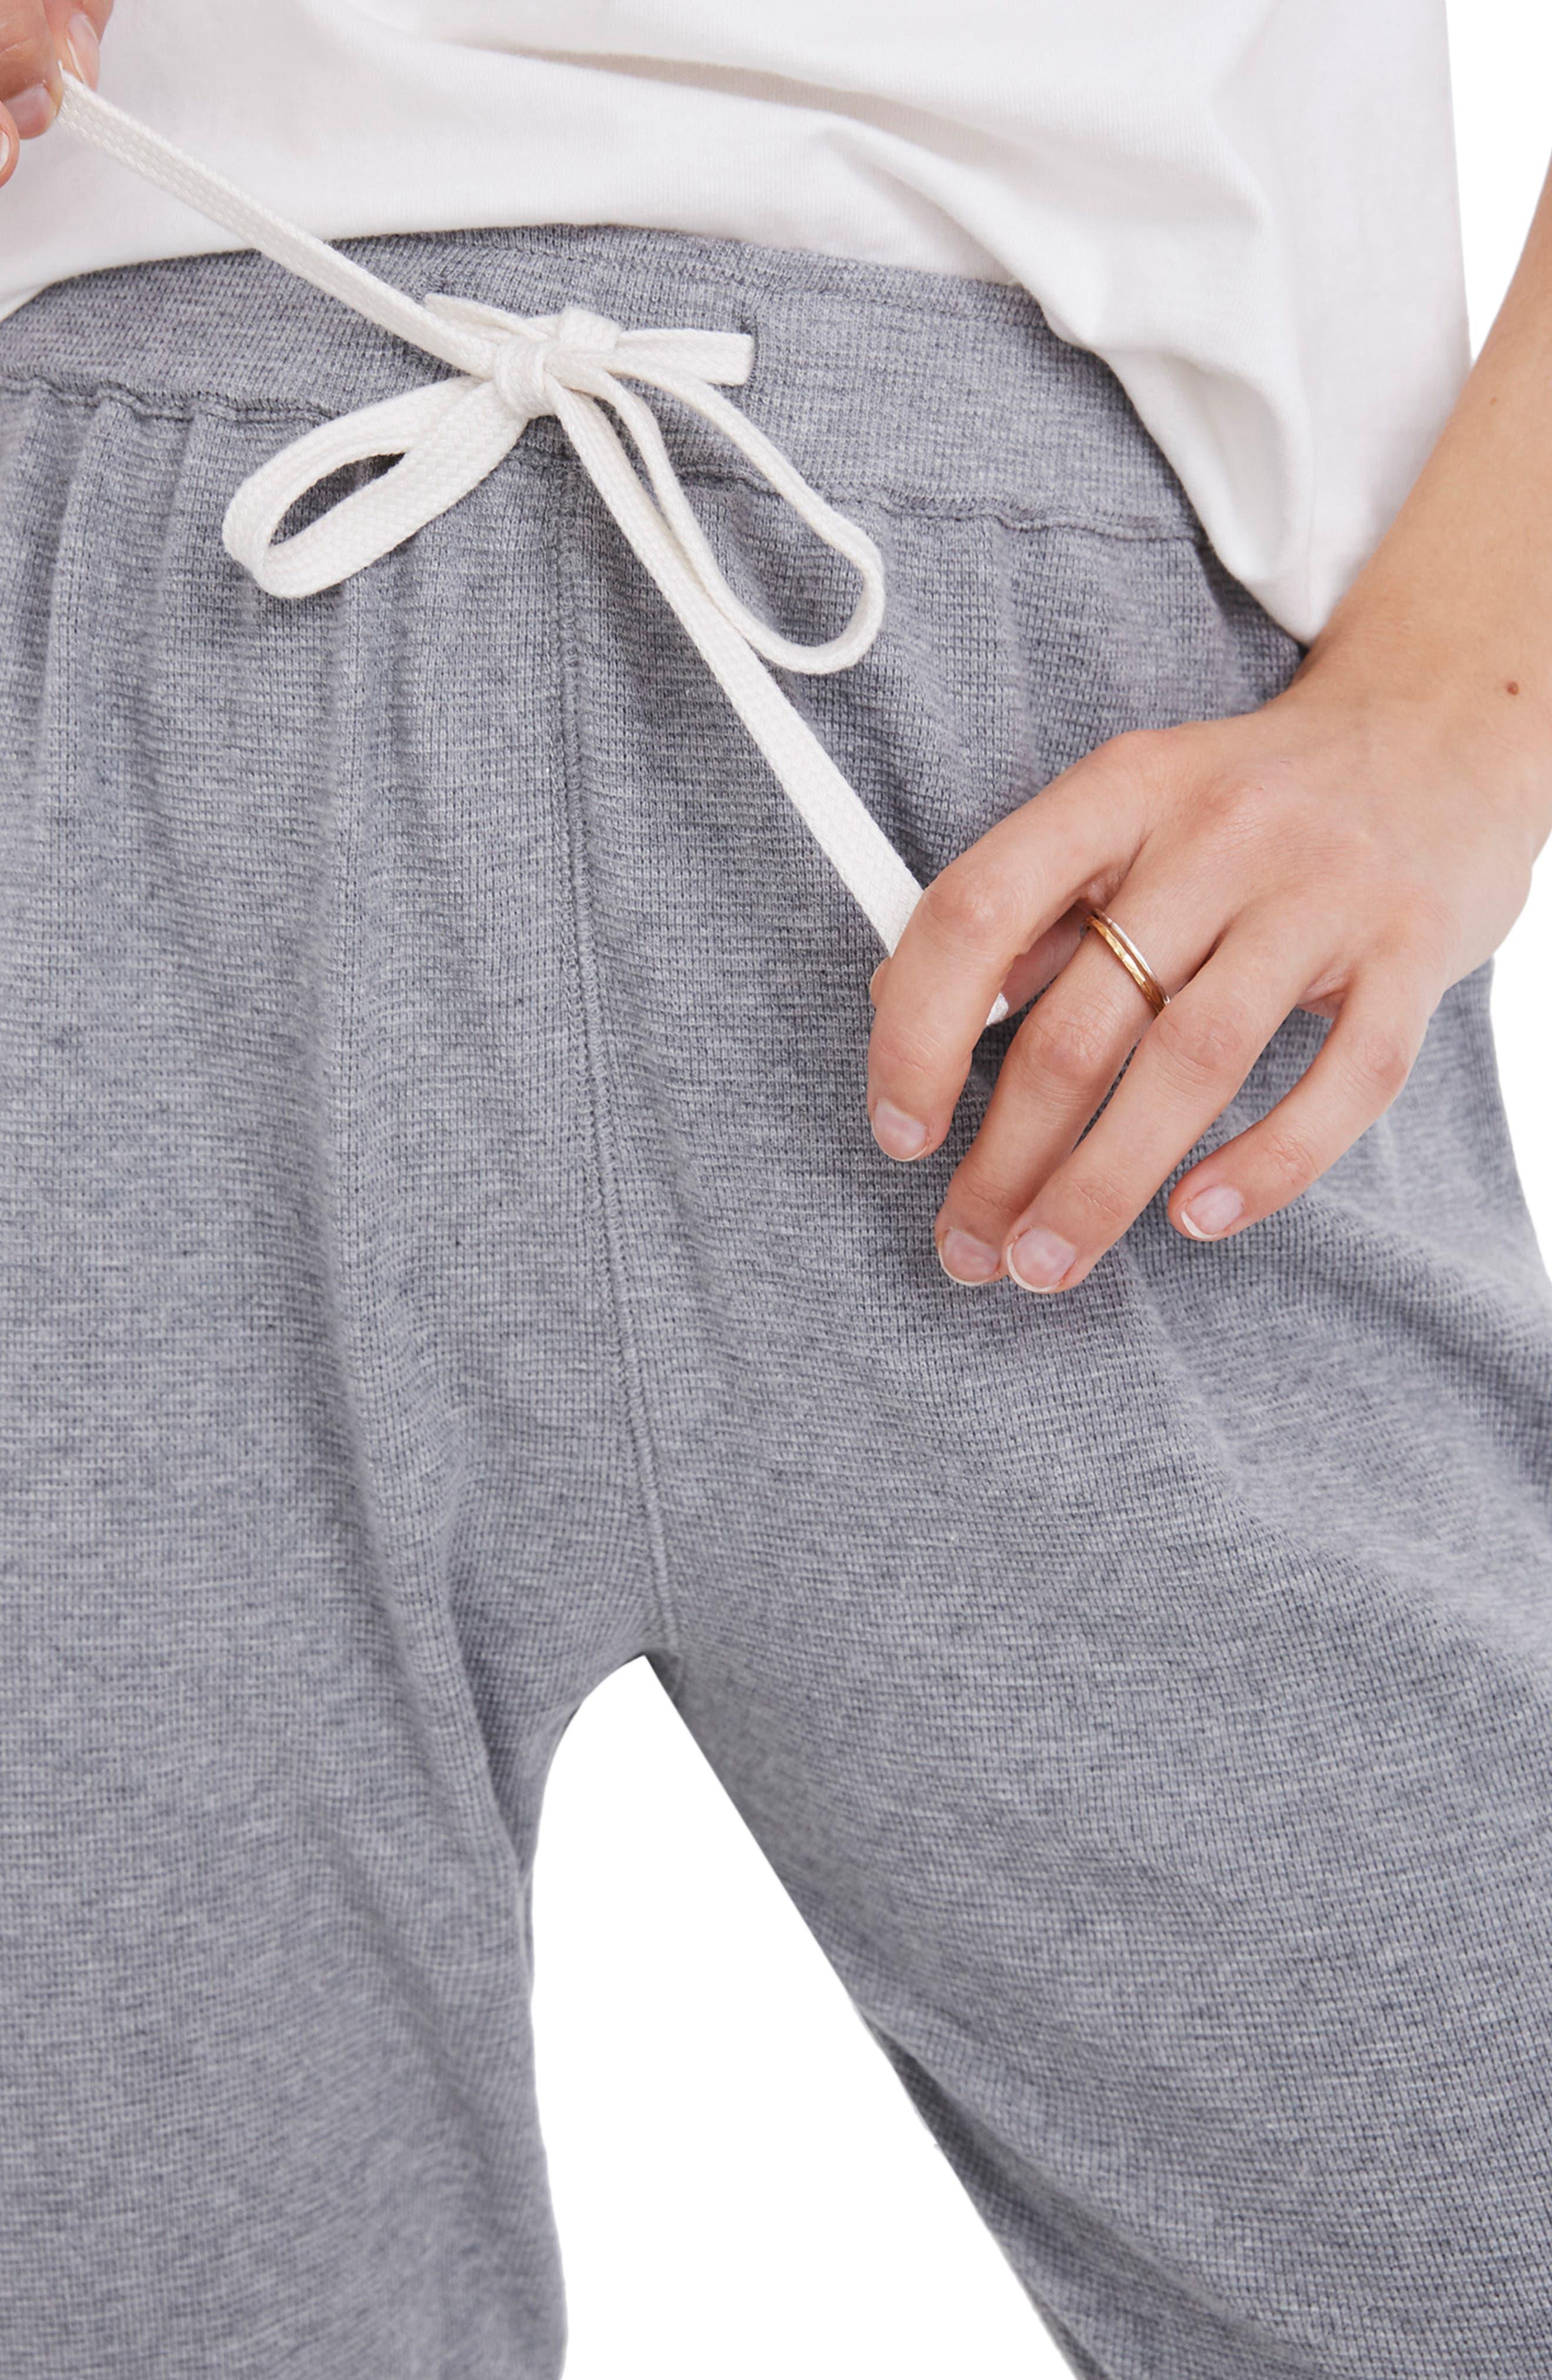 Honeycomb Pajama Sweatpants,                             Alternate thumbnail 4, color,                             HEATHER PEPPER